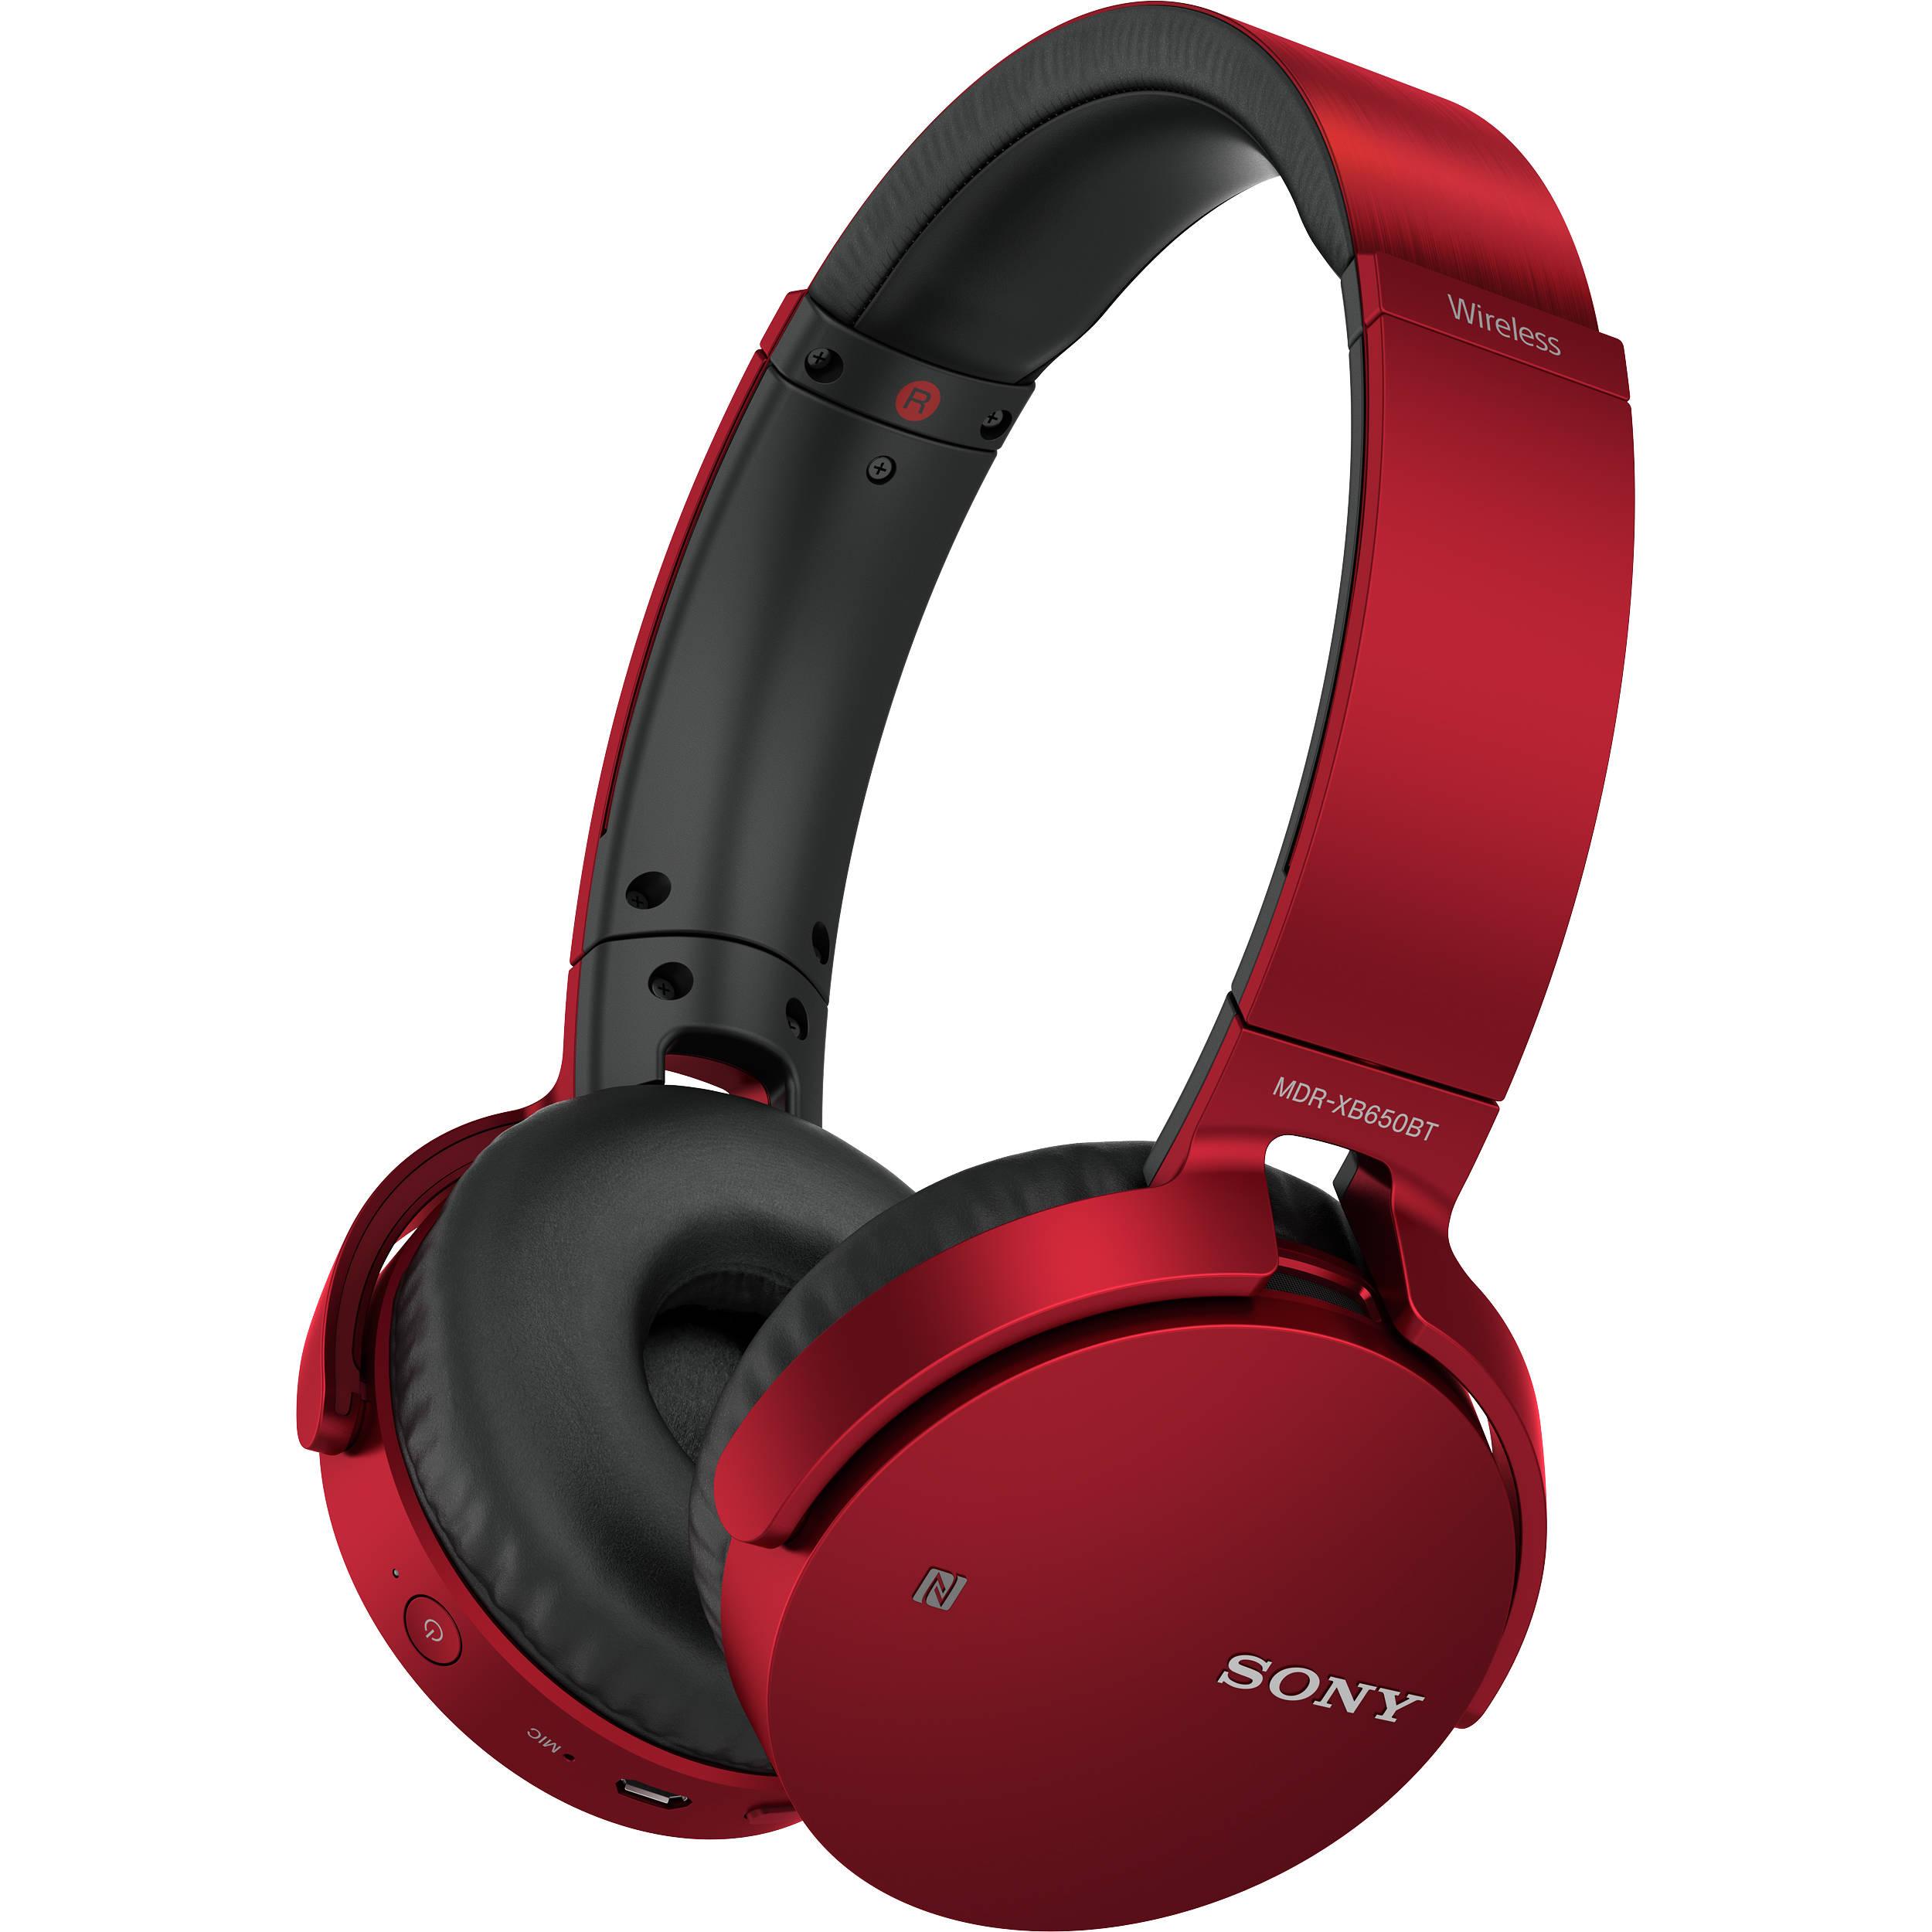 Sony red bluetooth headphones - headphones sony mdrv6